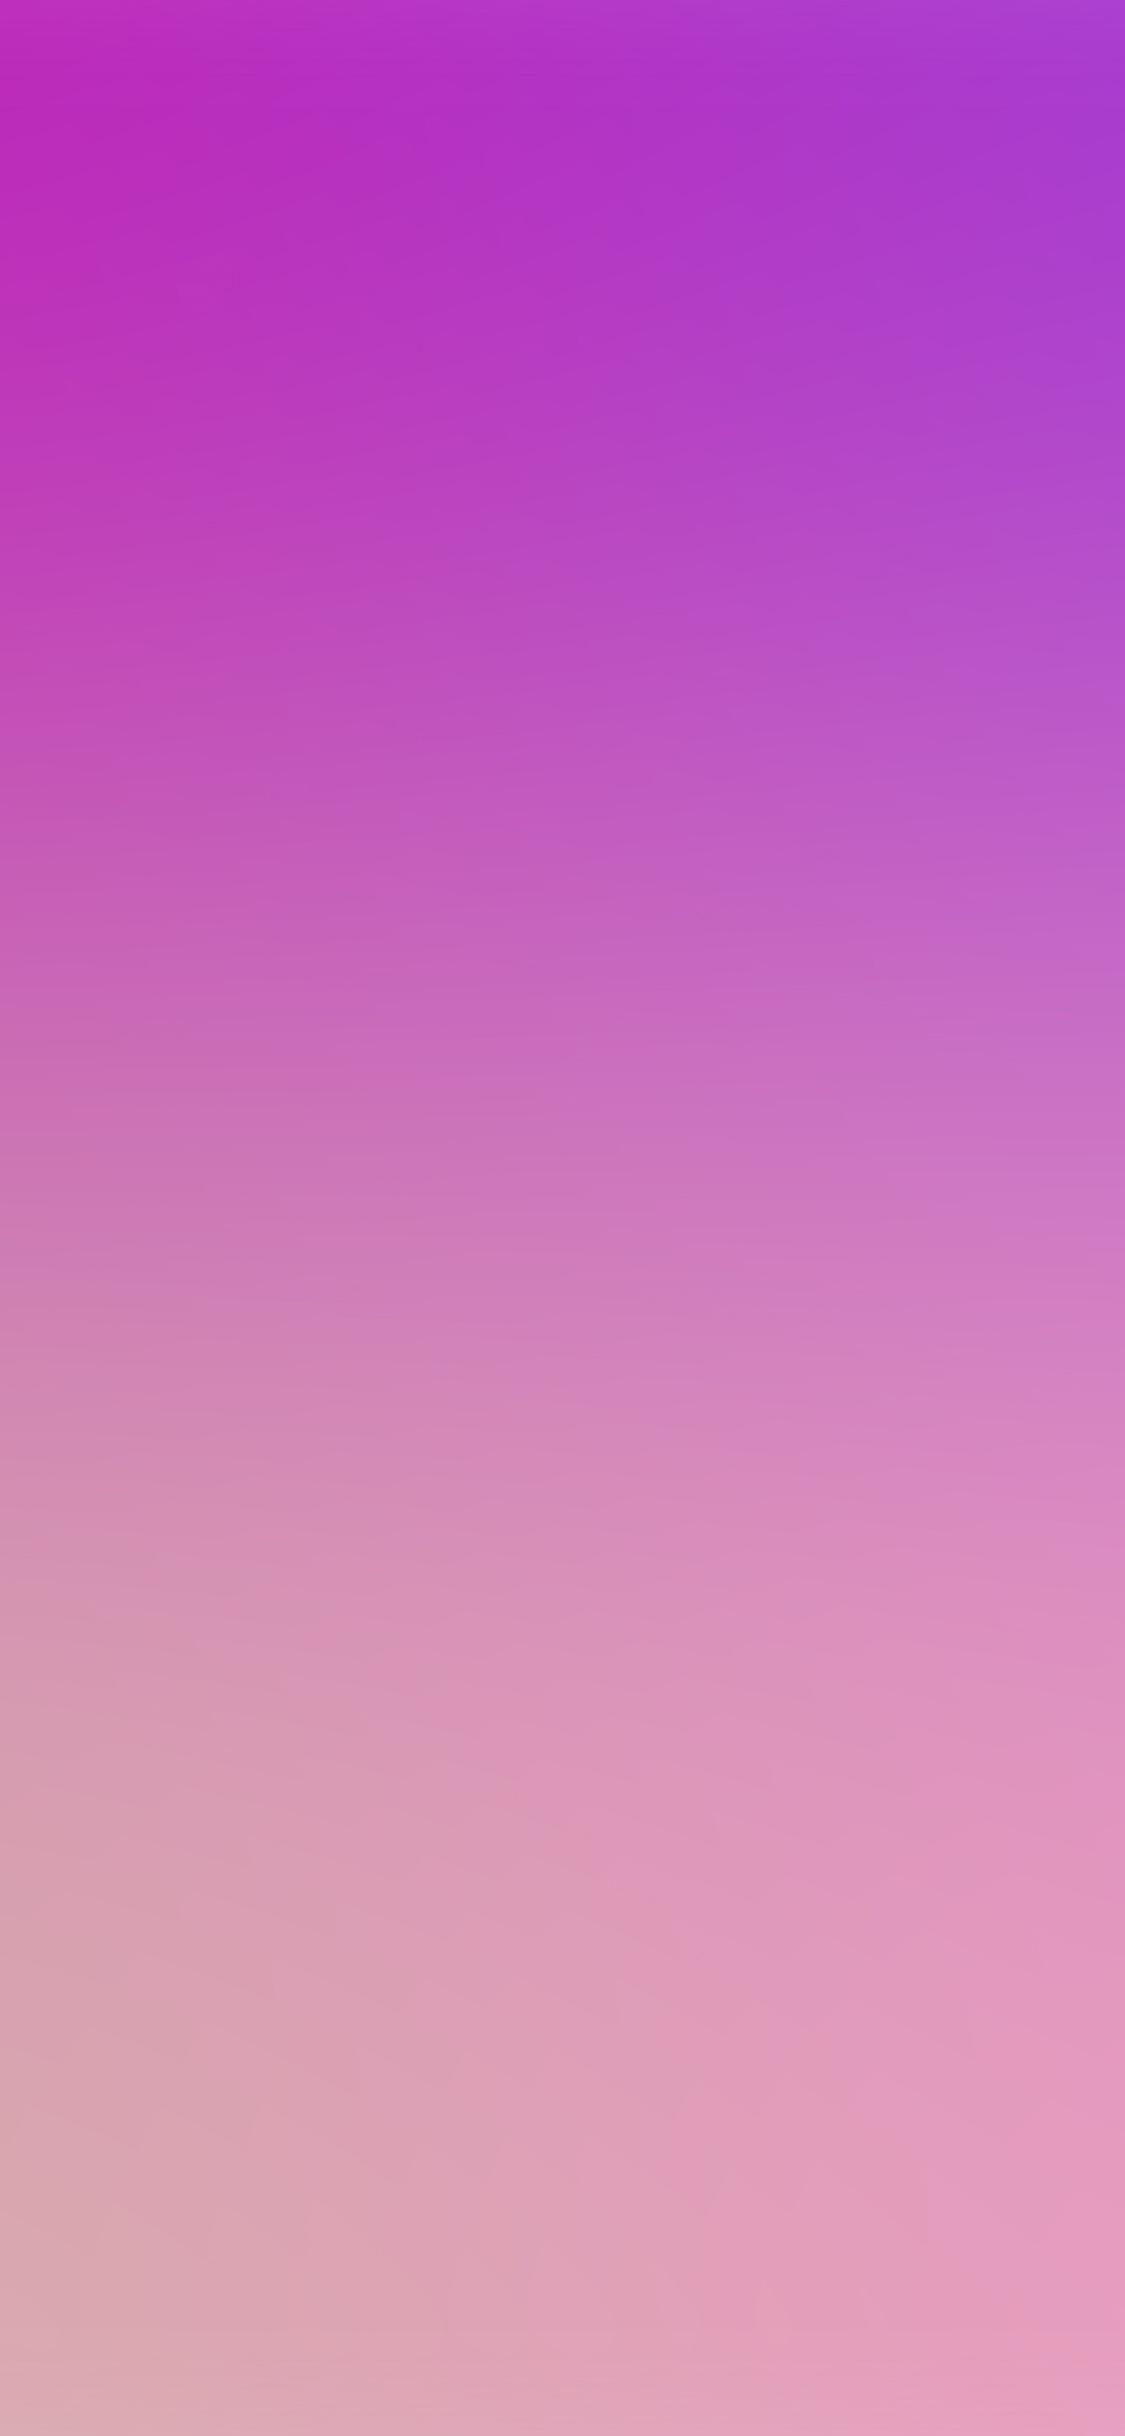 iPhoneXpapers.com-Apple-iPhone-wallpaper-sj89-pink-purple-morning-gradation-blur